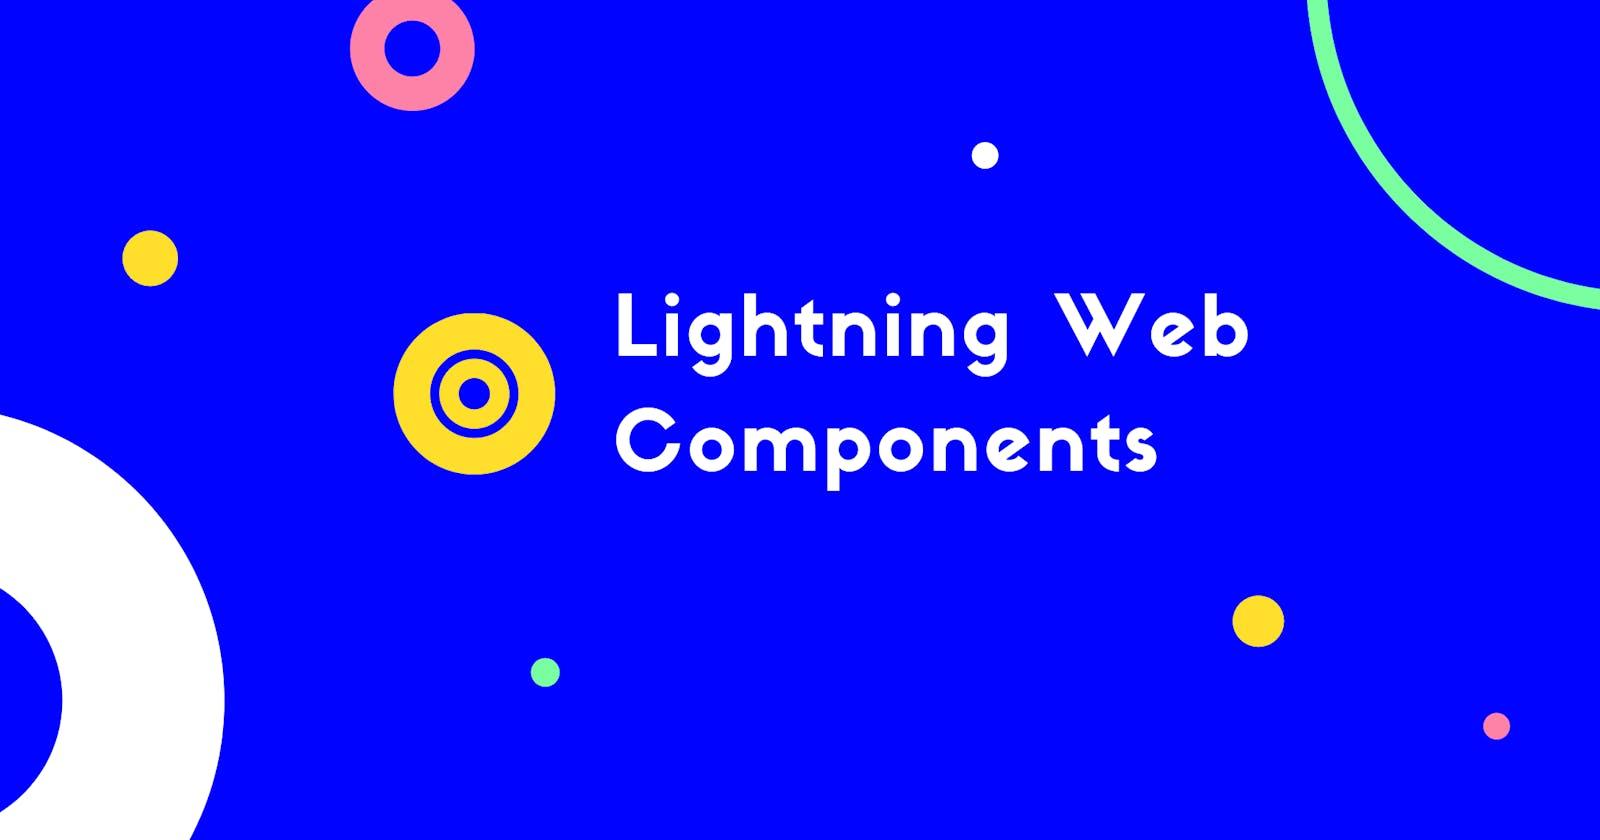 Lightning web components - Rendering Lists